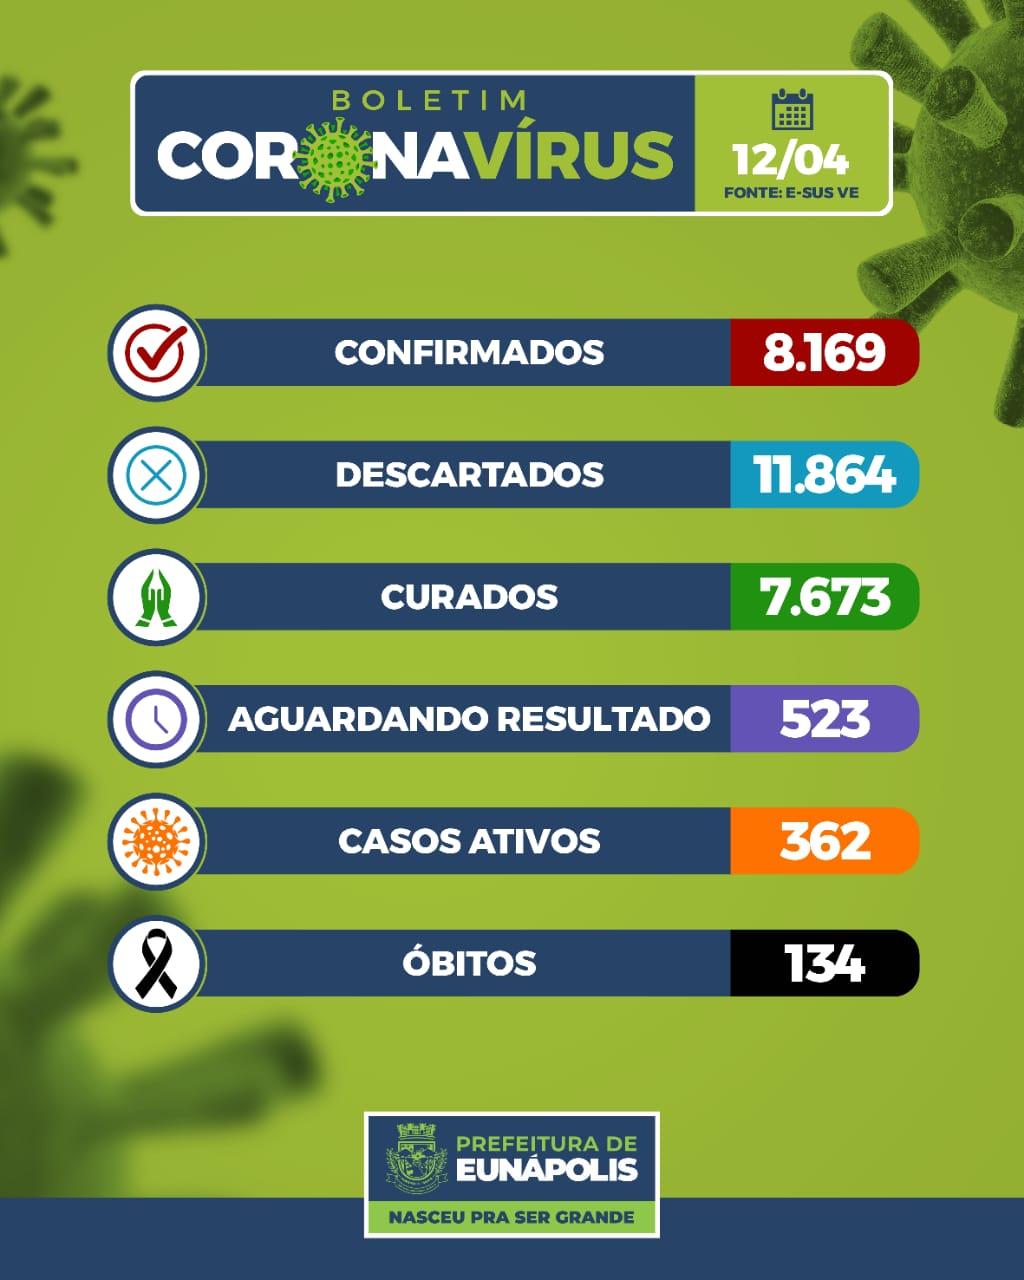 Boletim Epidemiológico Coronavírus do Município de Eunápolis para a data de hoje, 12/04/2021. 23